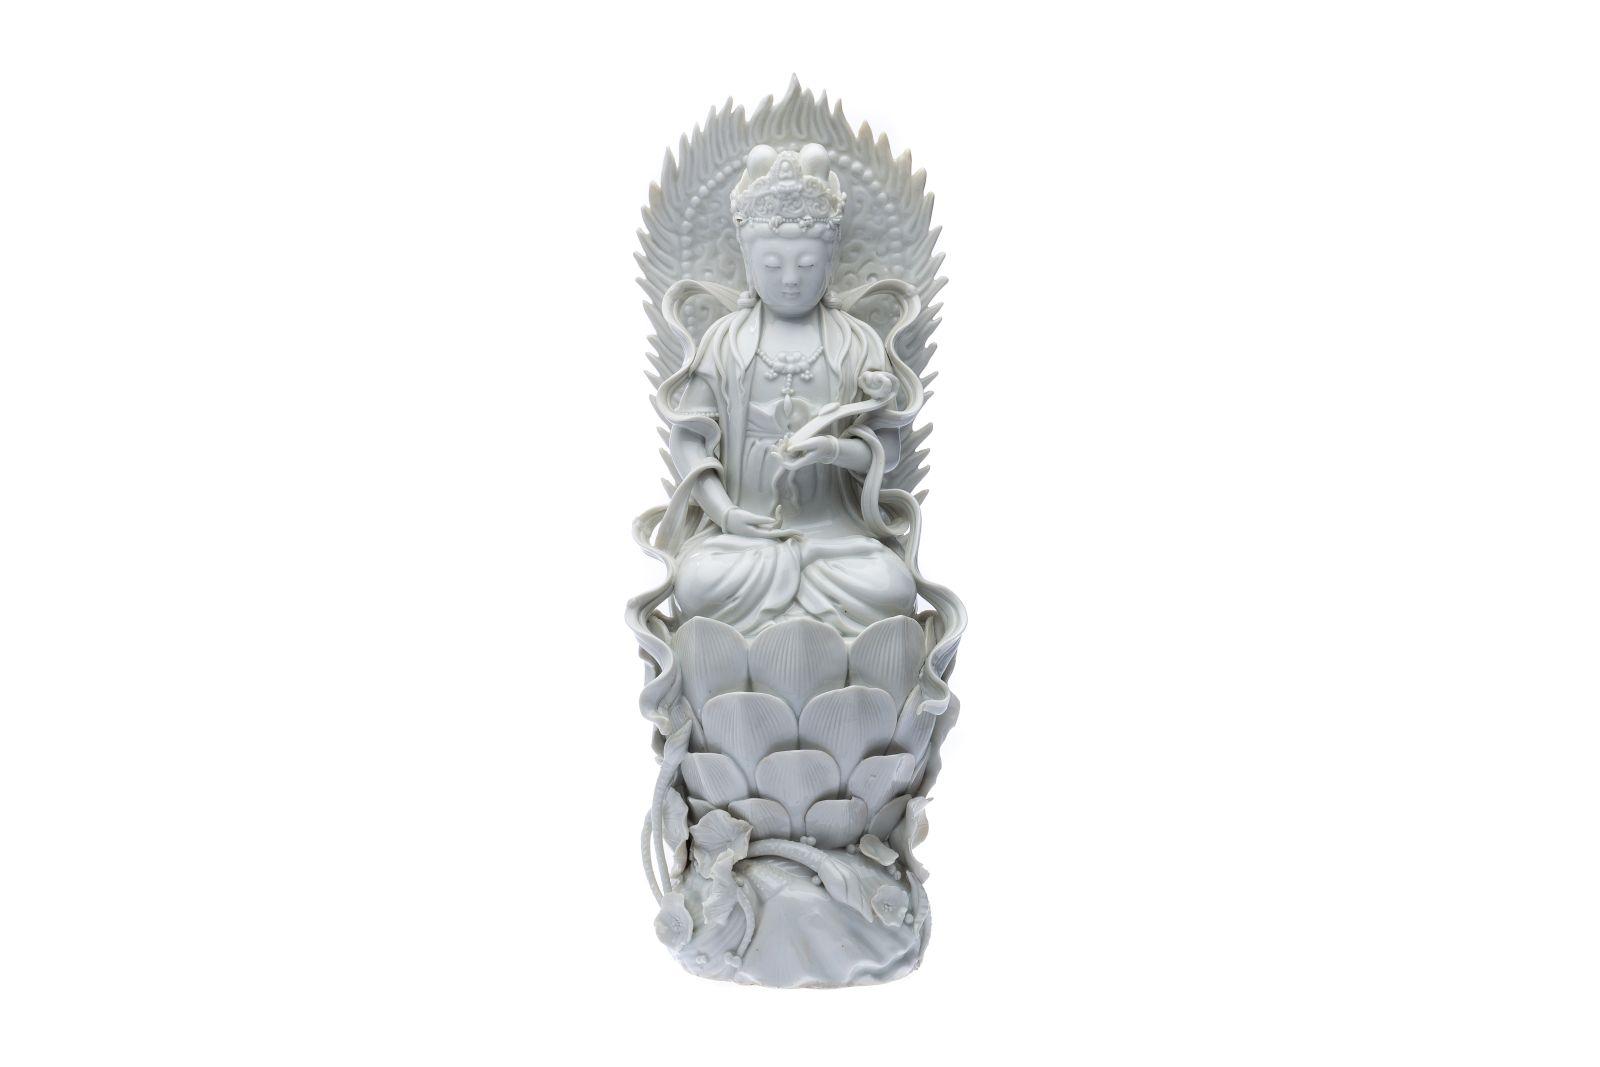 #25 Blanc de Chine Image